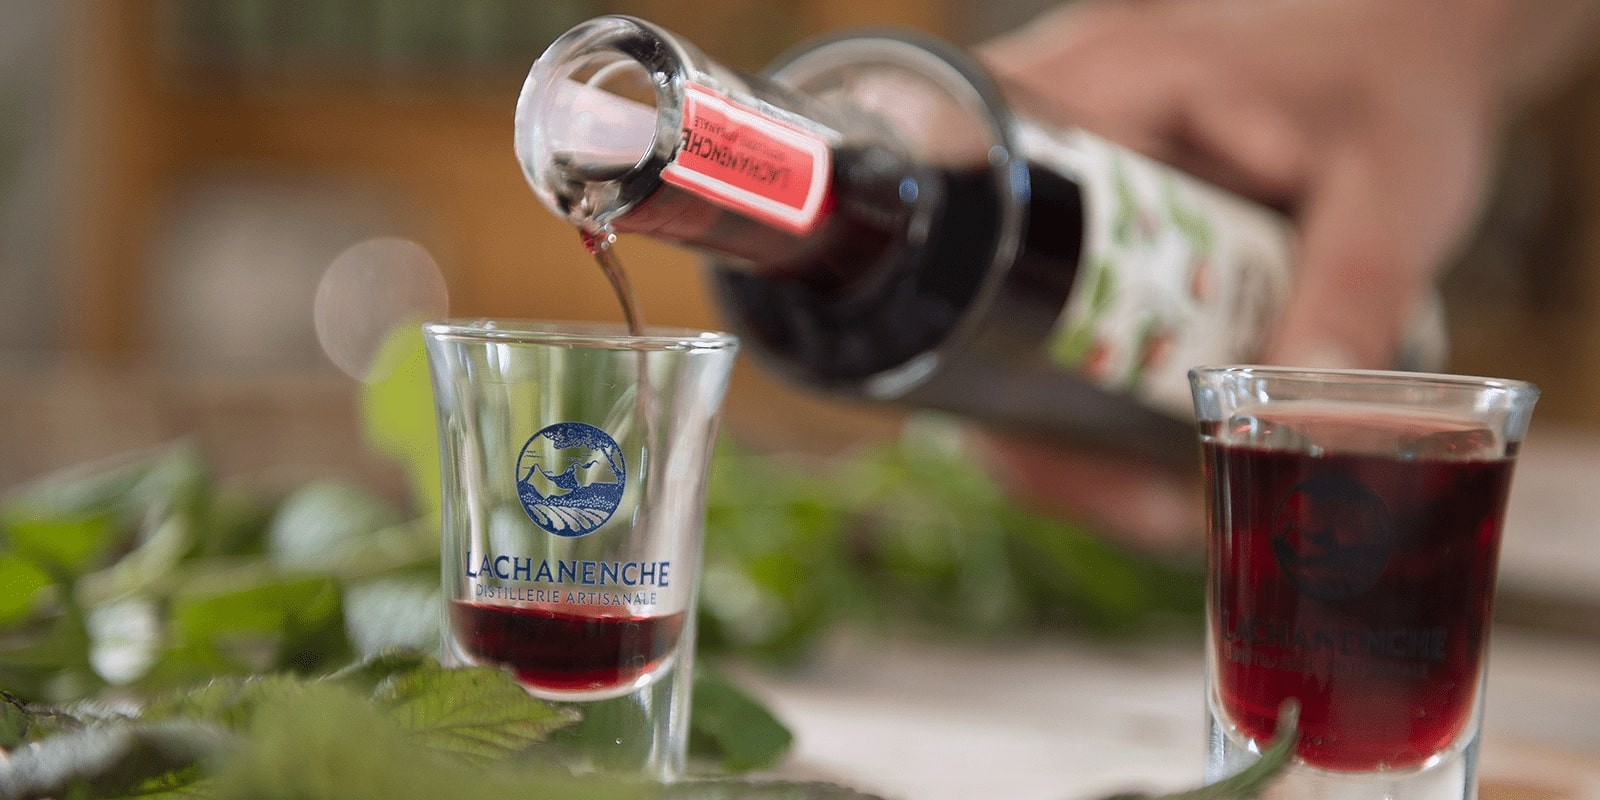 Une distillerie au cœur de l'Ubaye